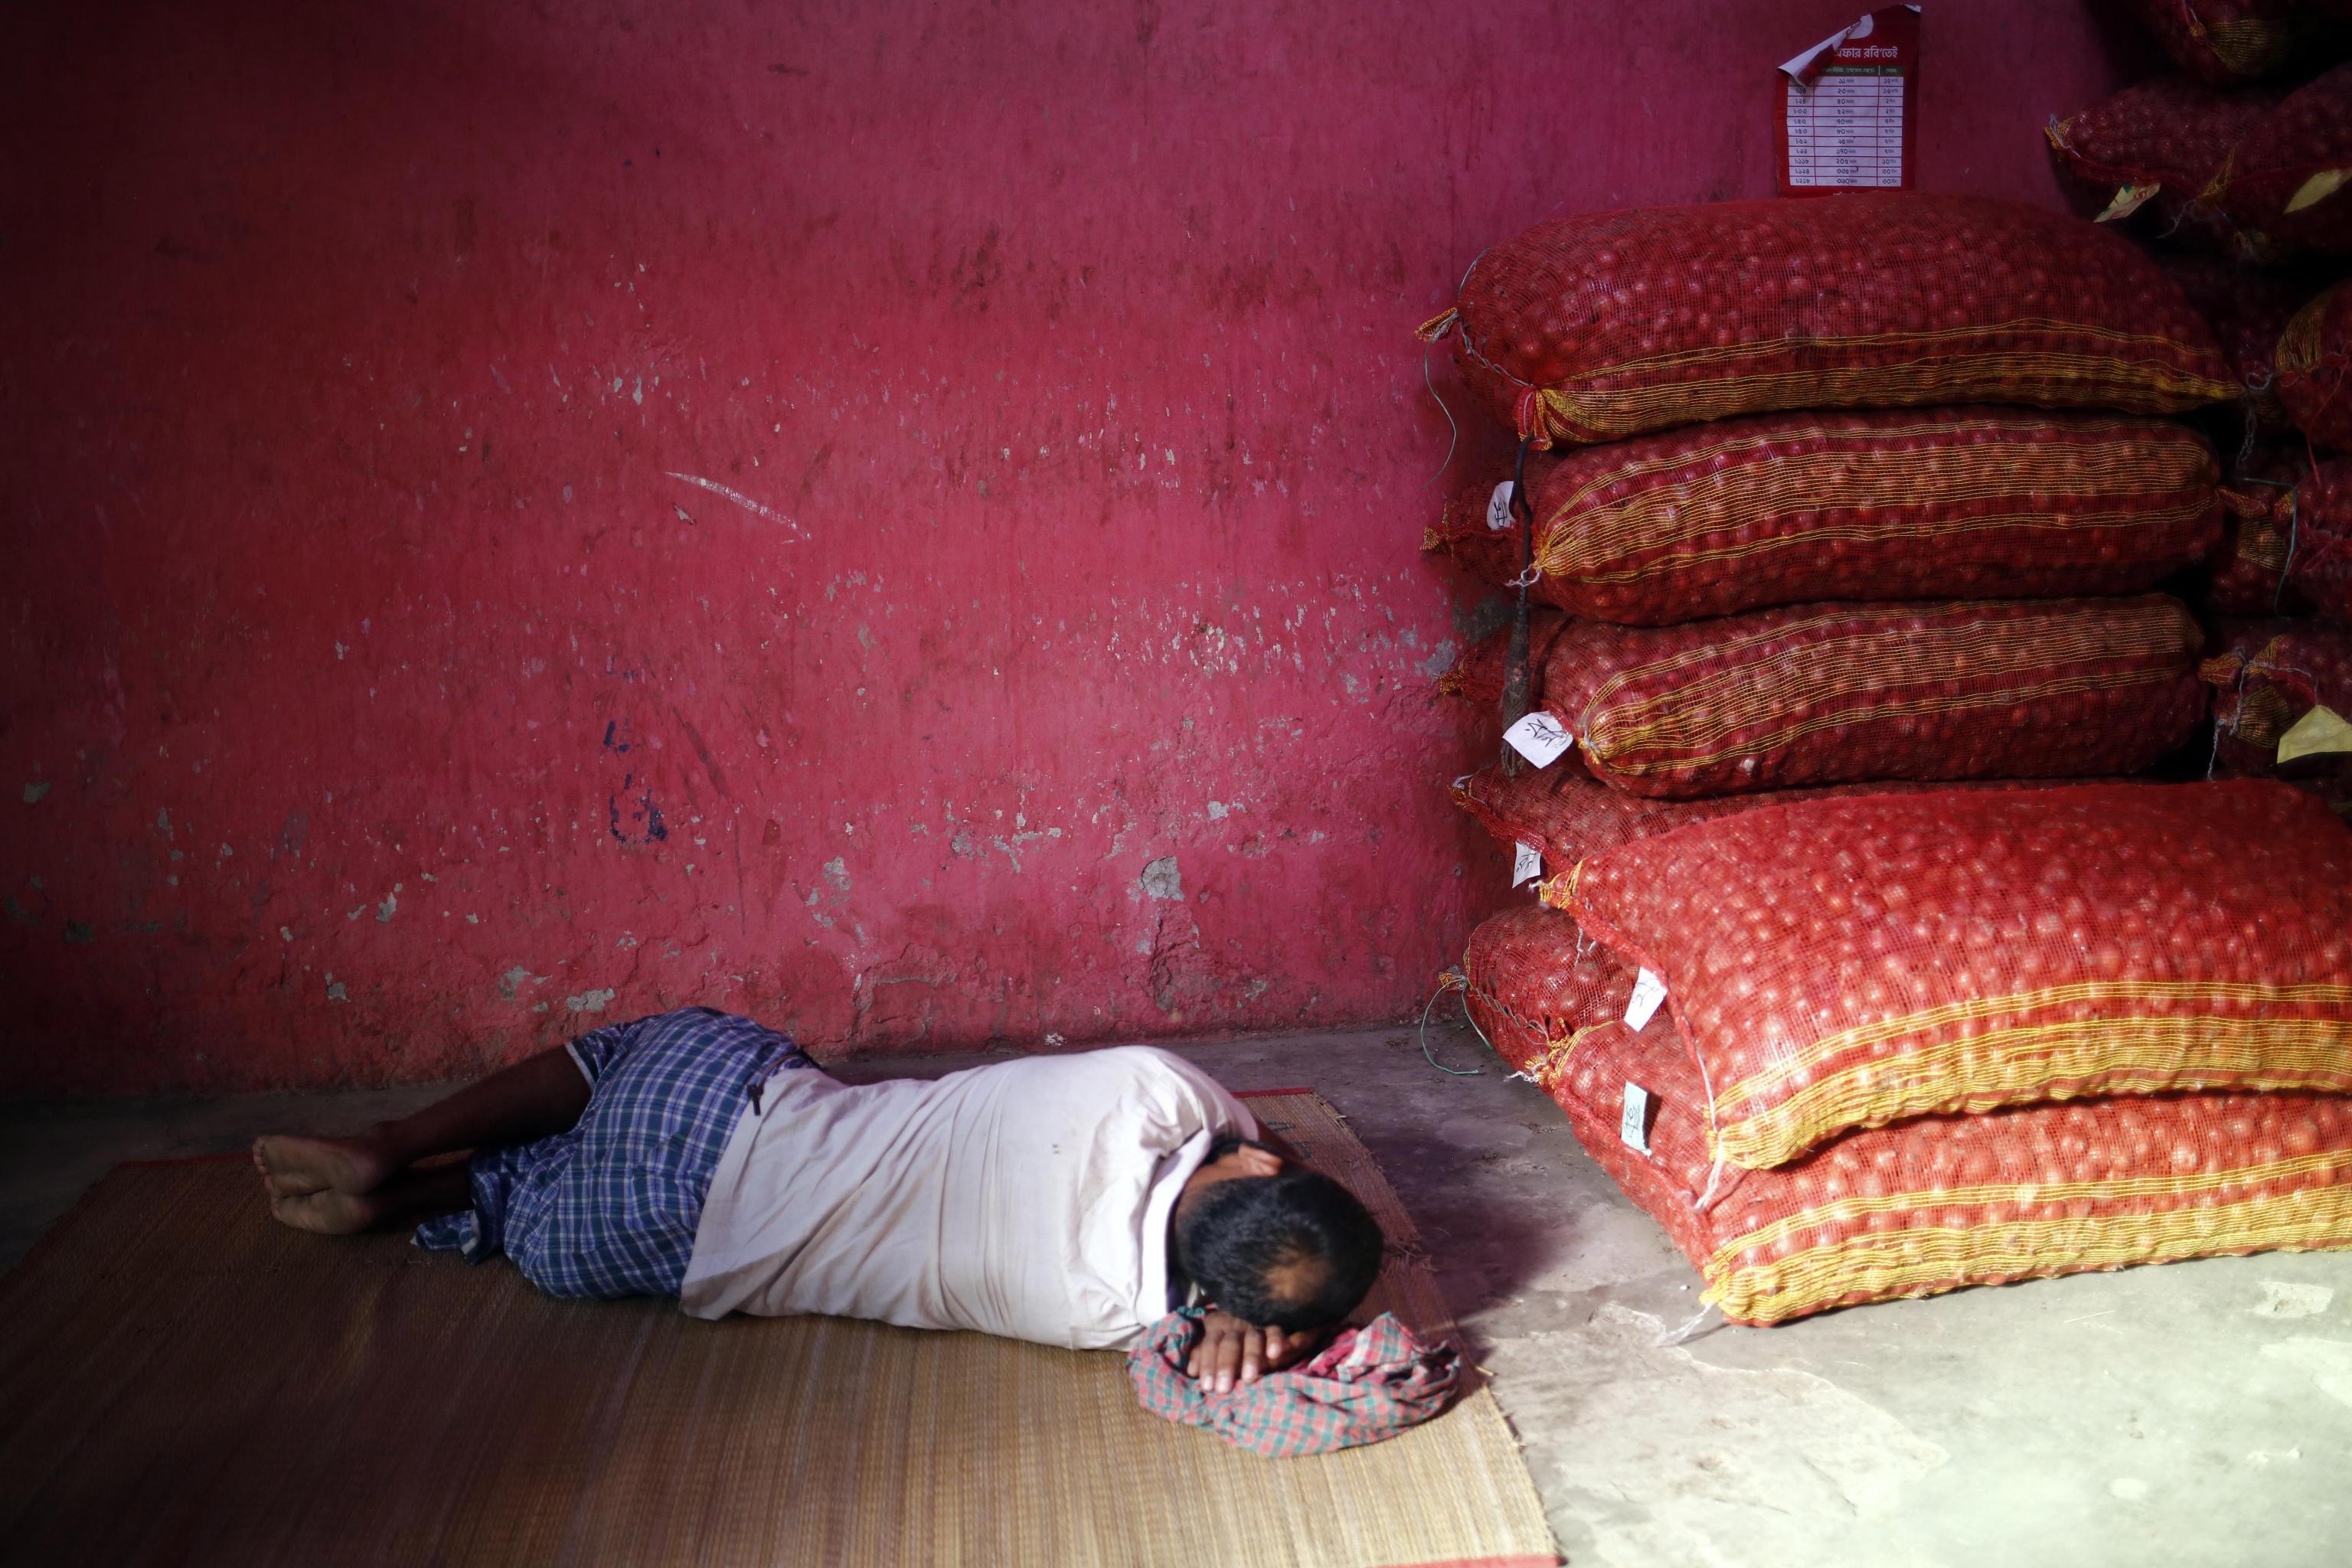 epa07827720 A Bangladeshi vendor sleeps at a vegetal wholesale market in the Shyam Bazar in Dhaka, Bangladesh, 08 September 2019.  EPA/MONIRUL ALAM